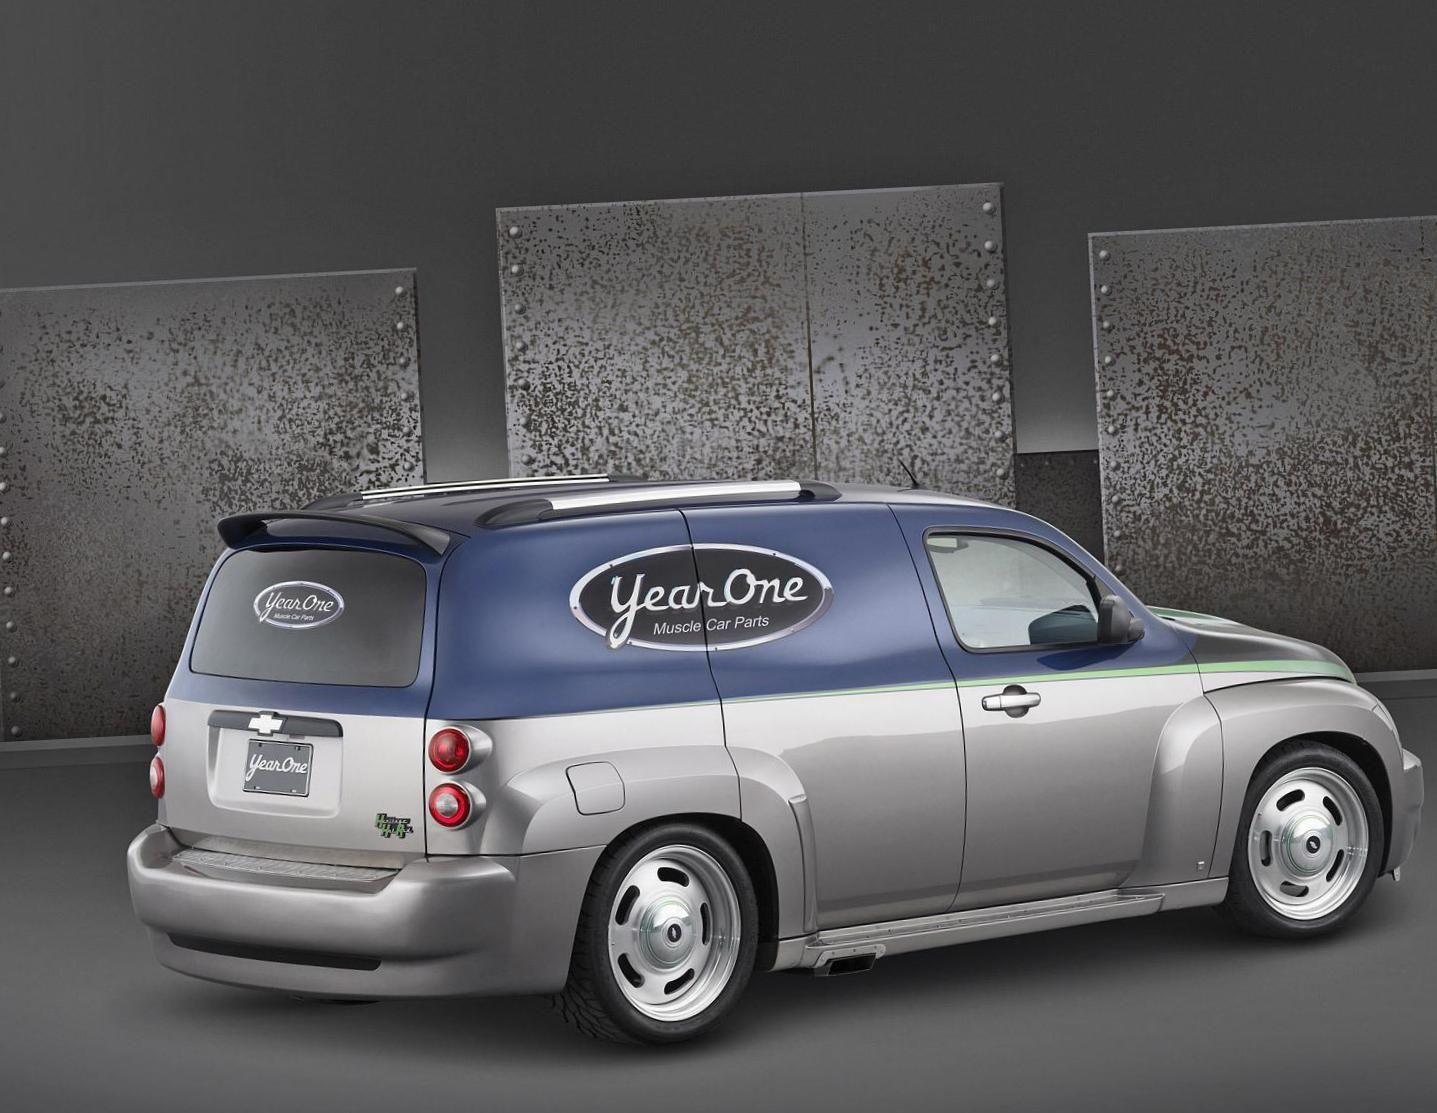 Chevrolet Hhr Specification Http Autotras Com Chevrolet